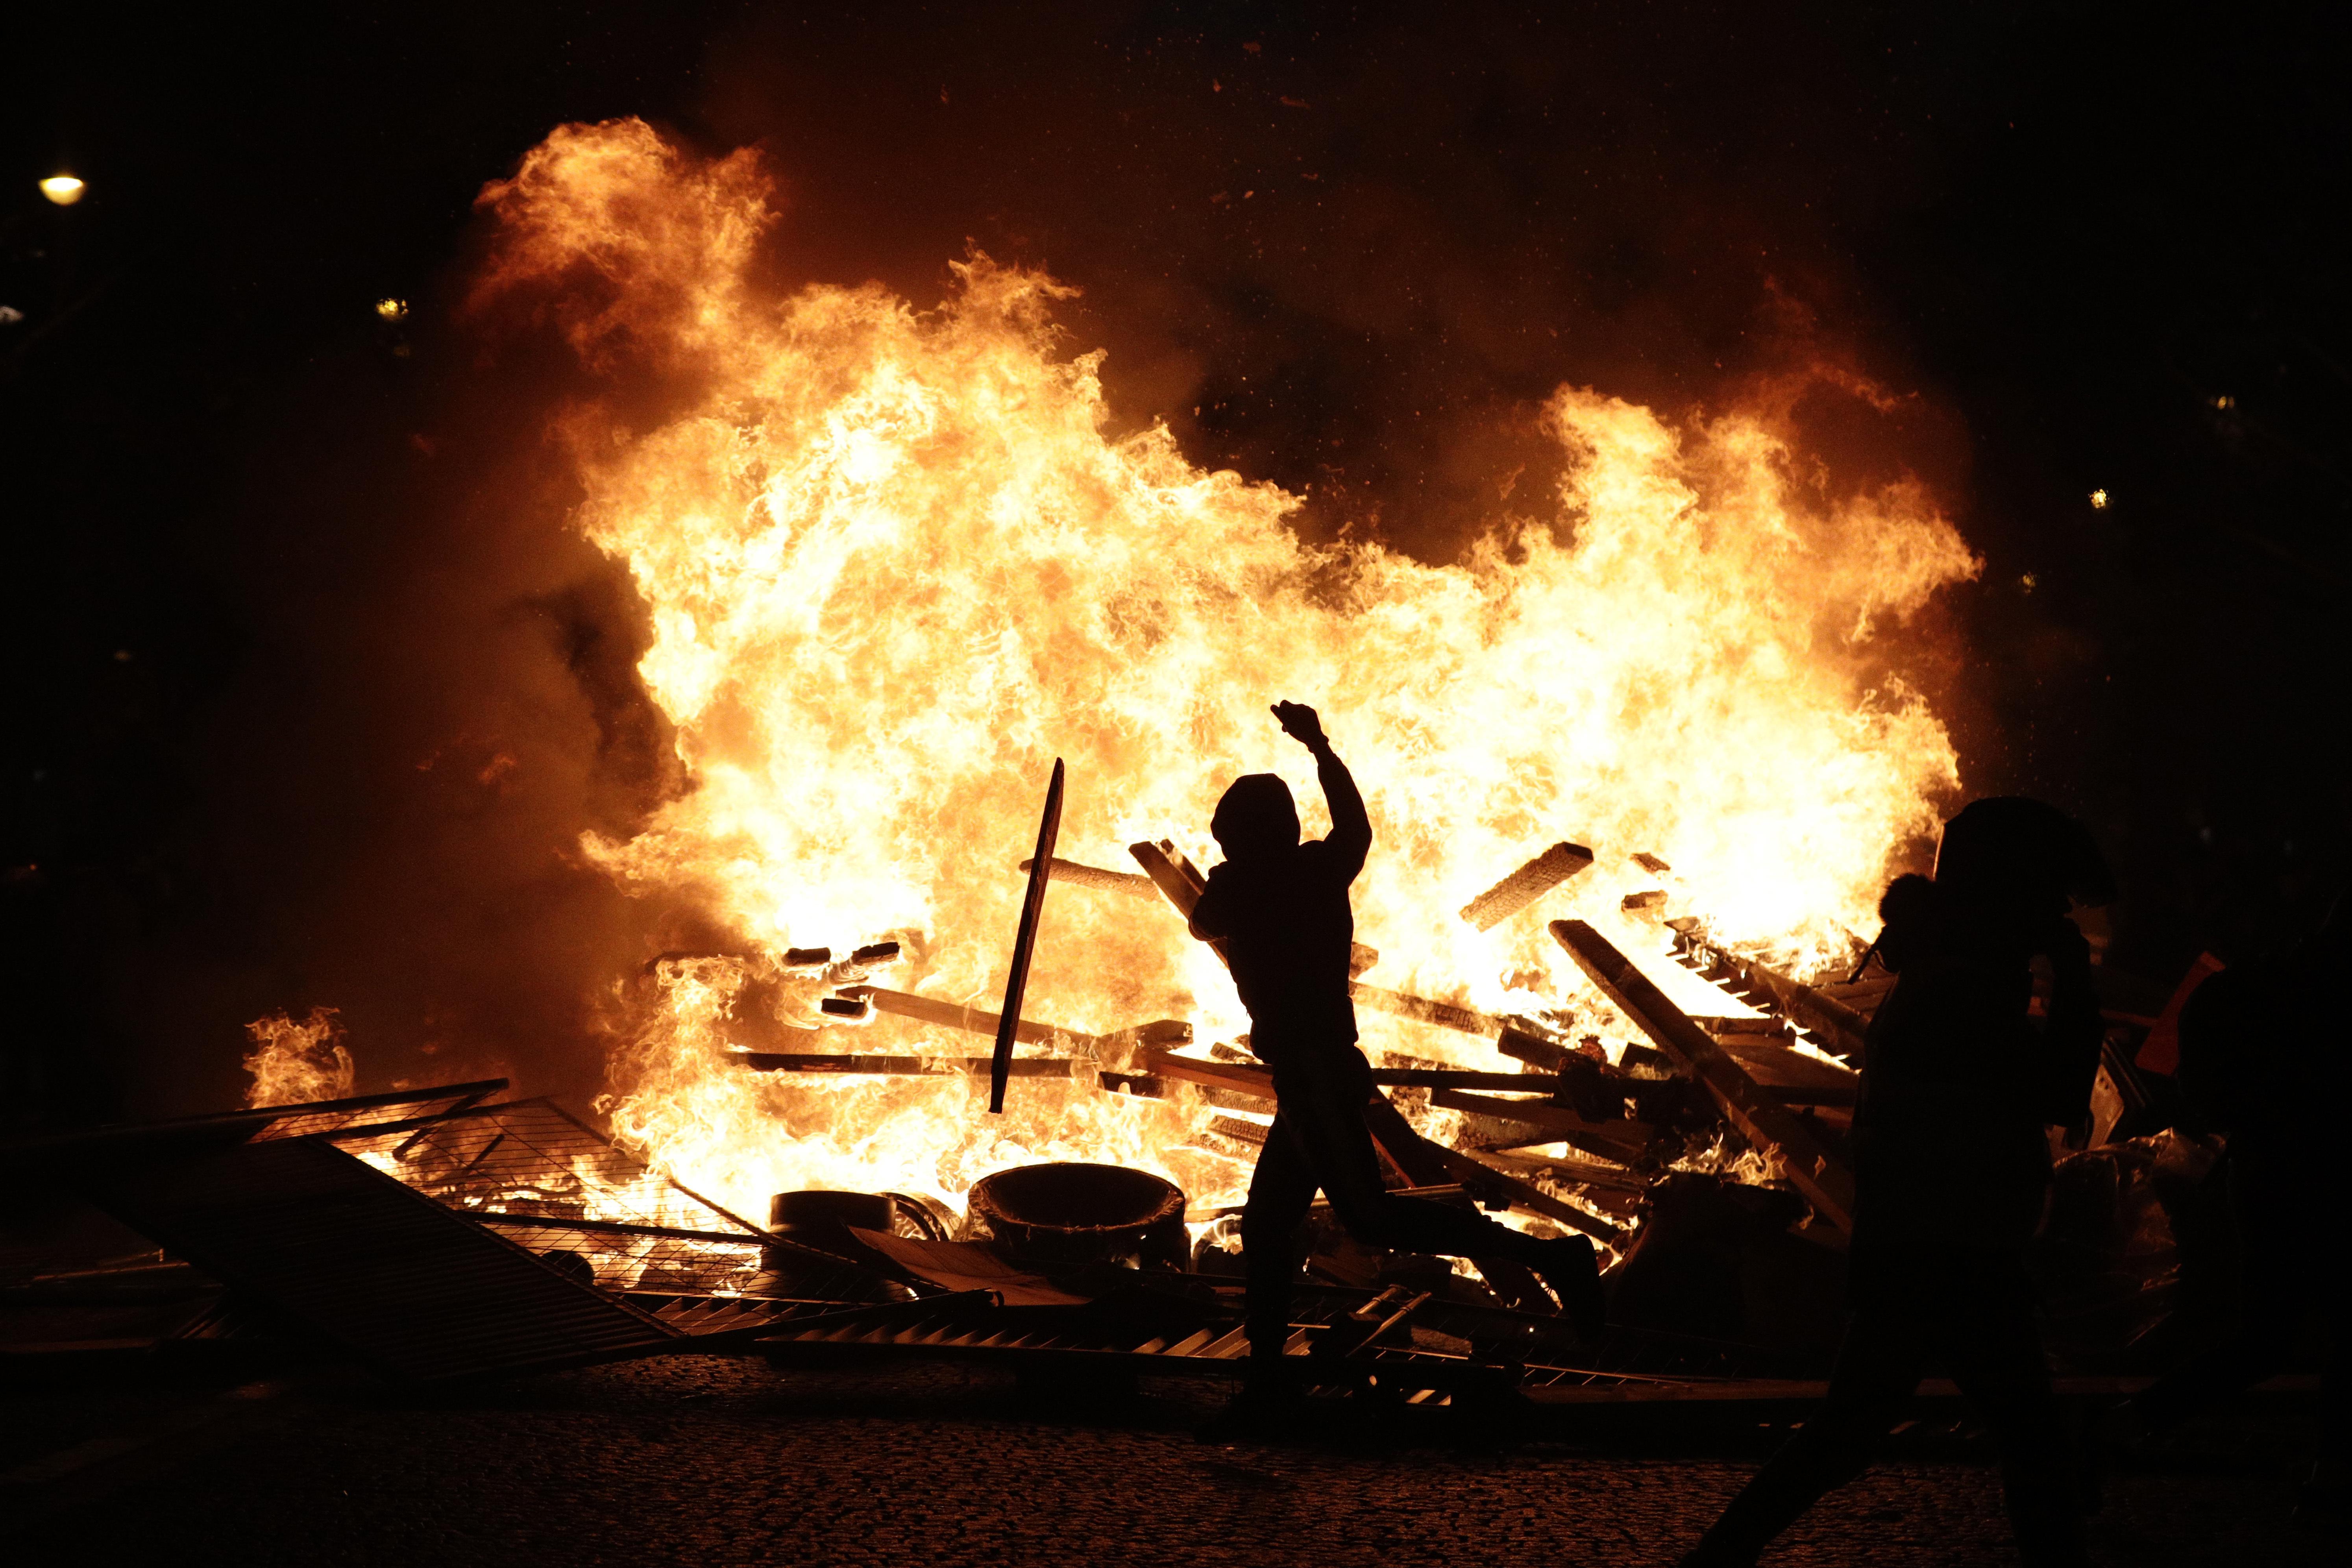 (AP Photo/Kamil Zihnioglu, File)